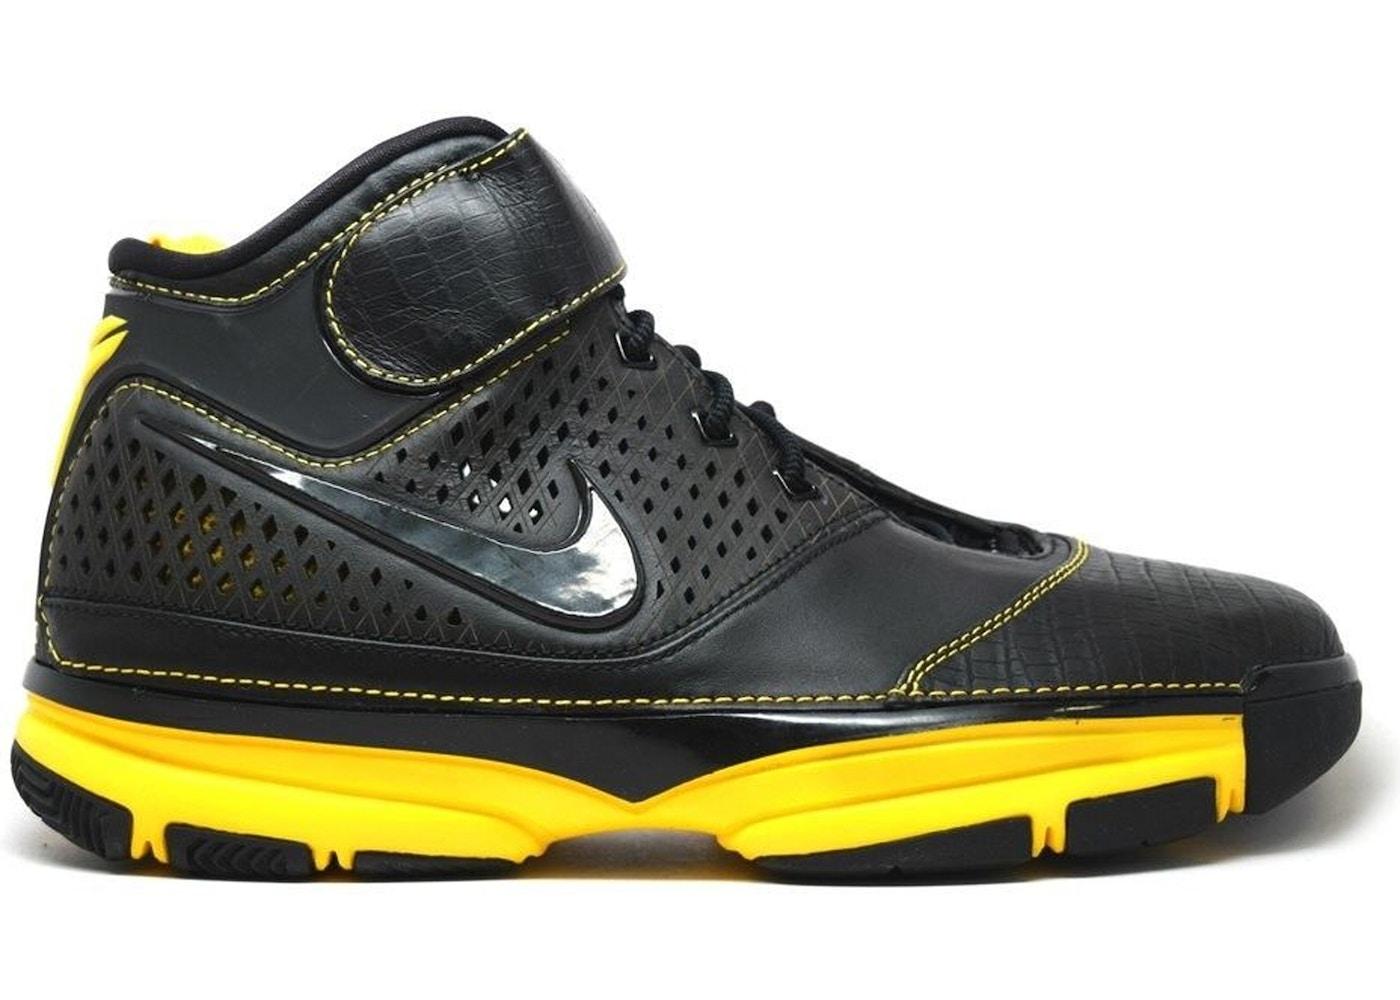 eaef7f27fdb1 Nike Kobe 2 Shoes - Average Sale Price